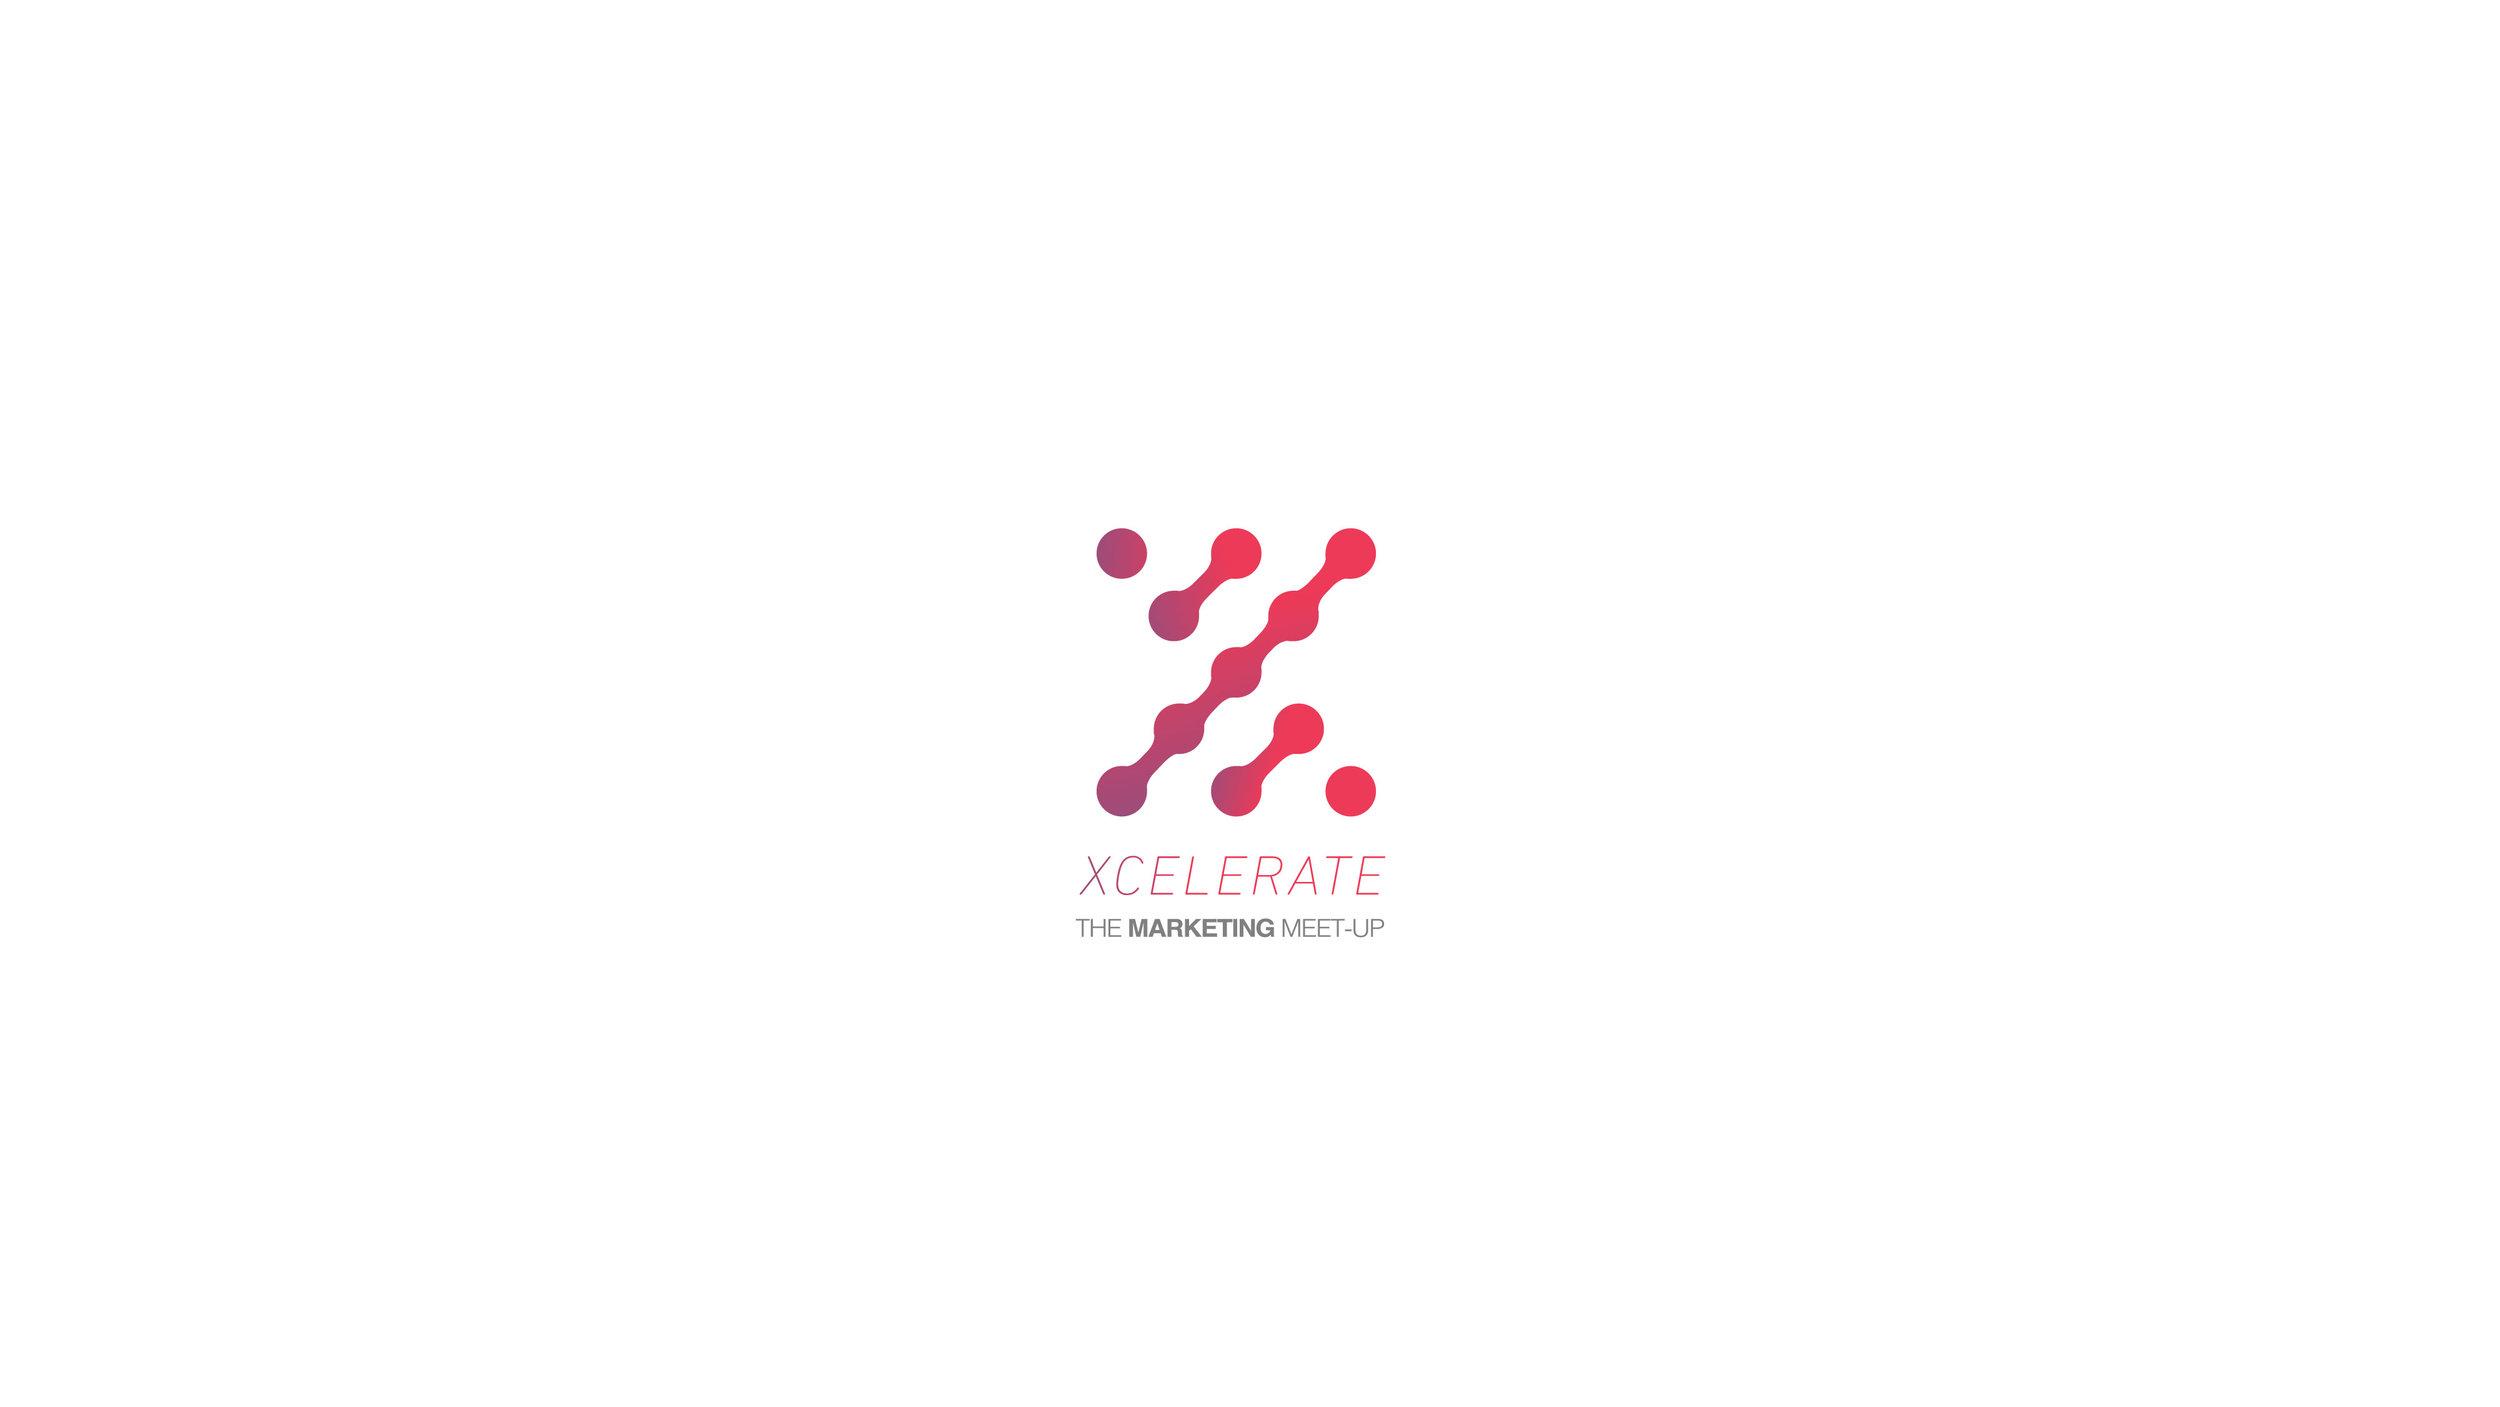 Xcelerate_V3-12.jpg